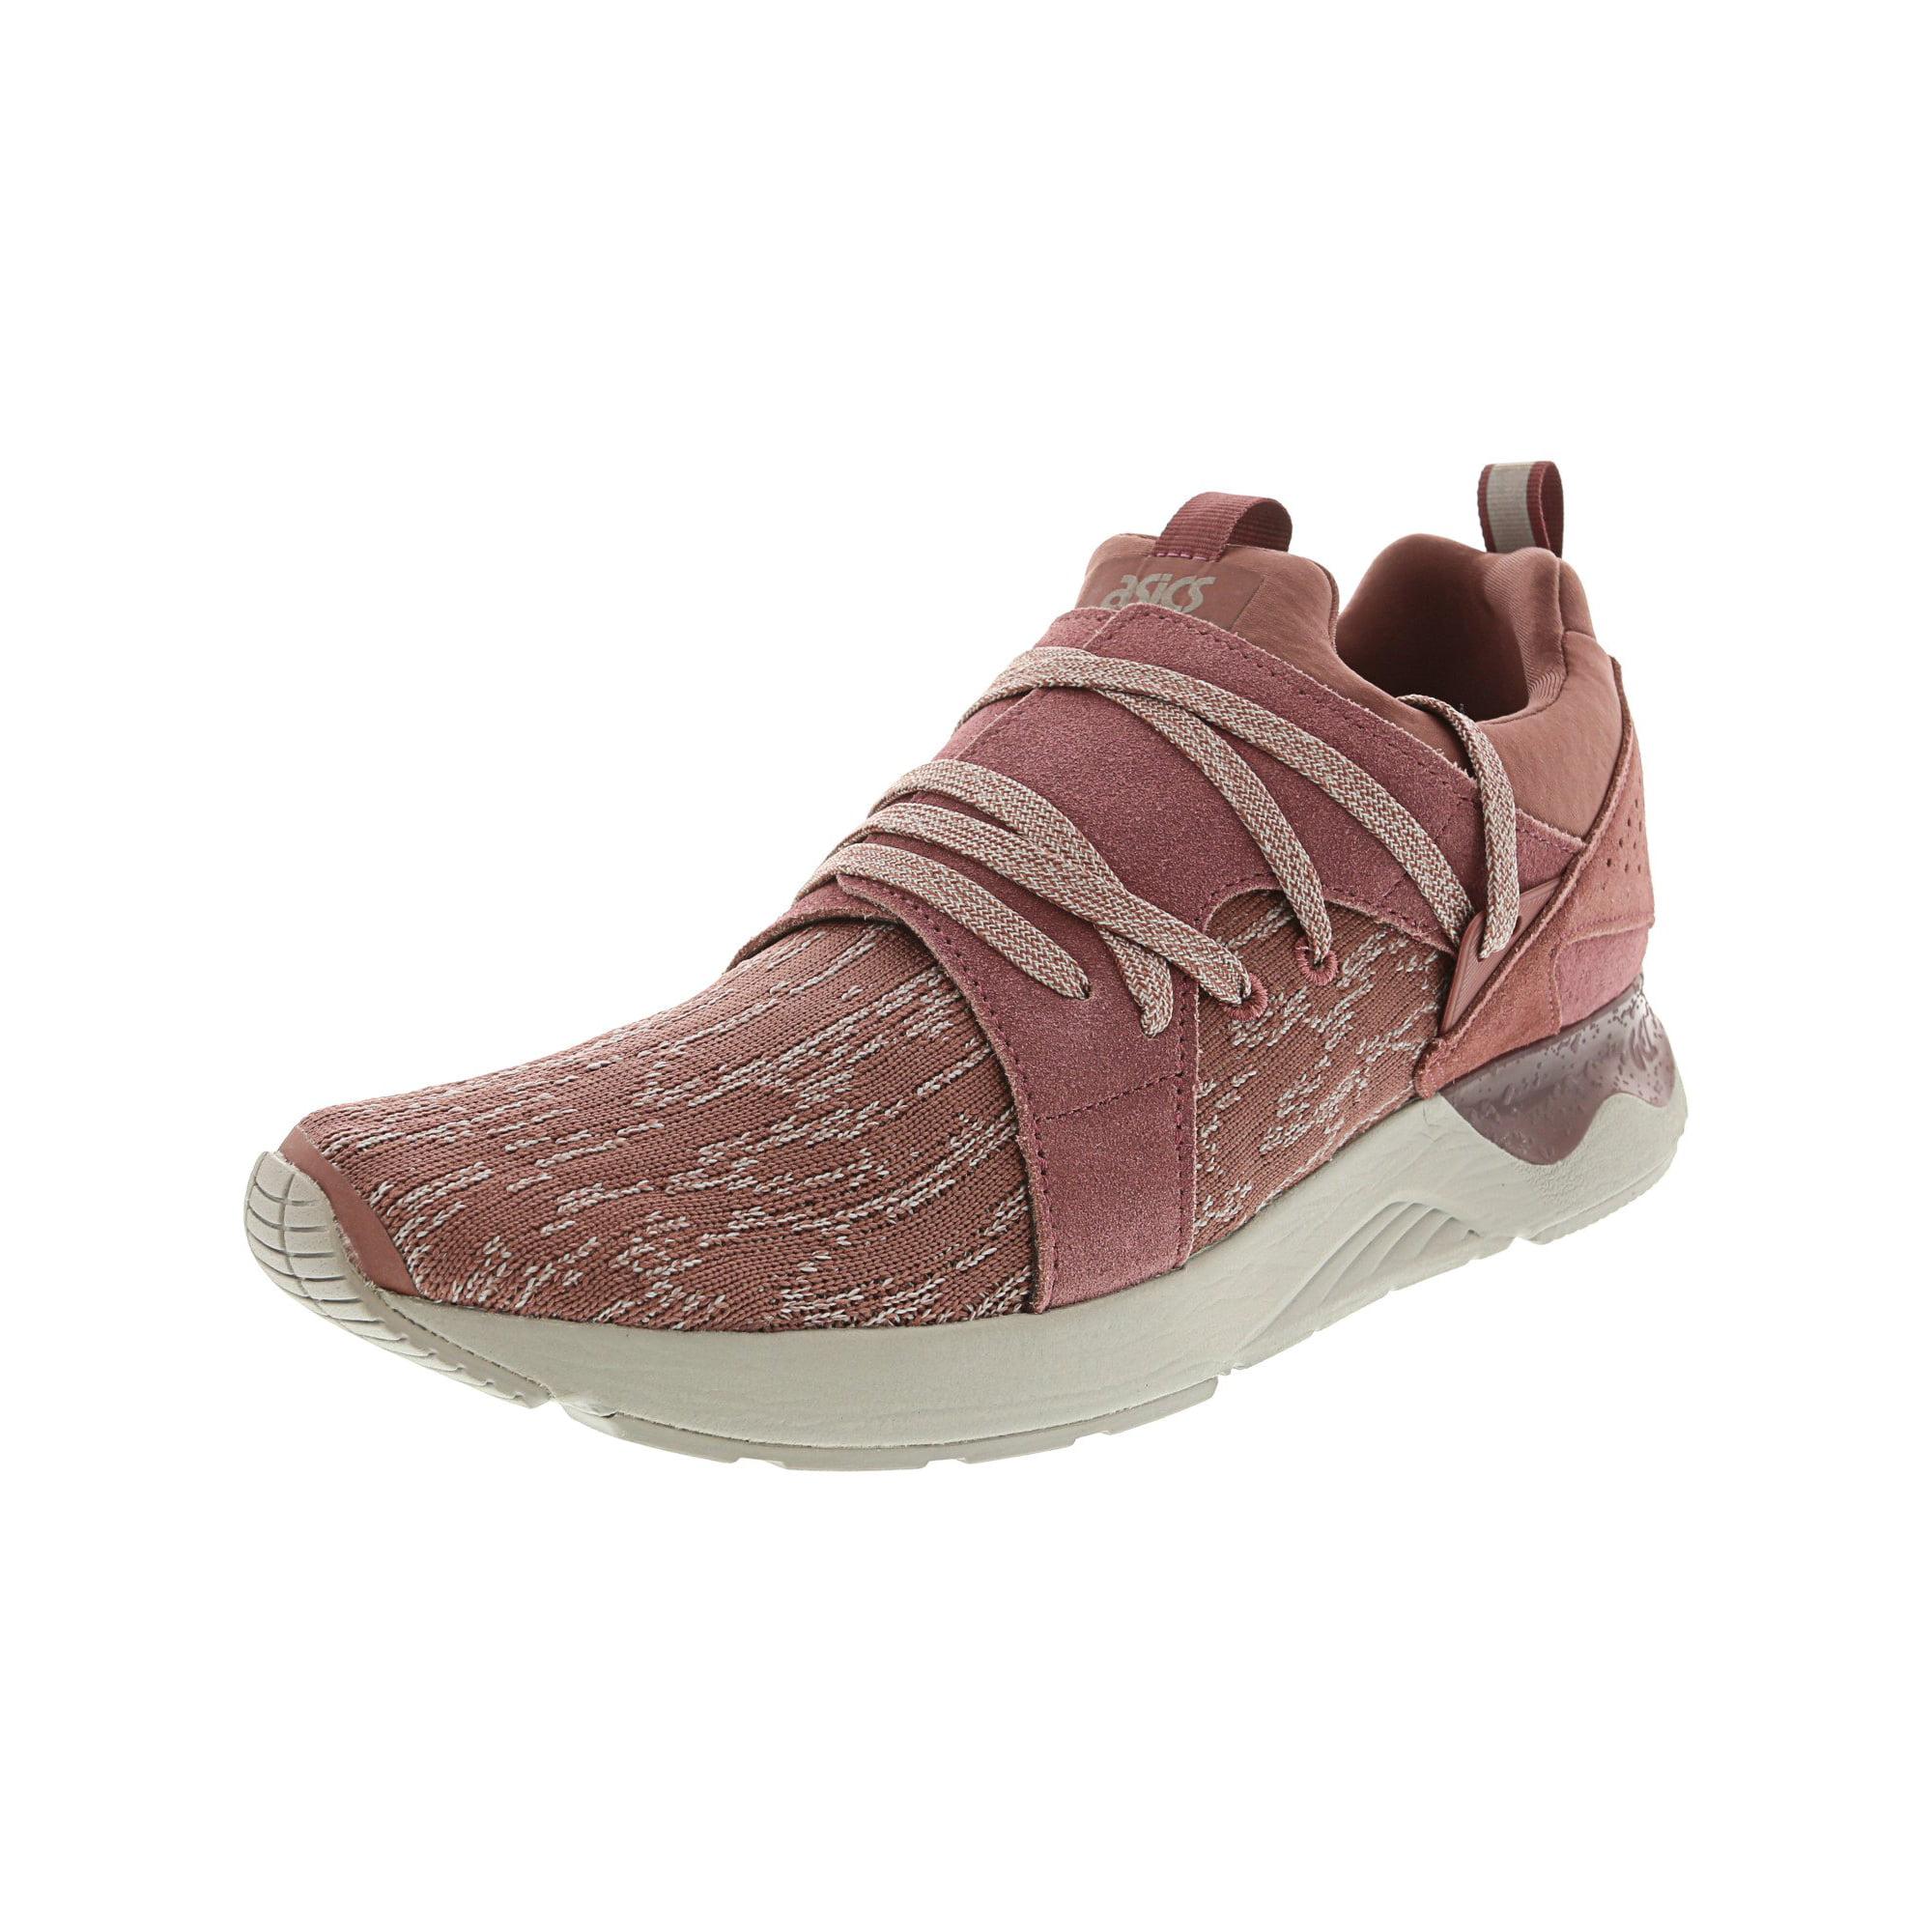 taille 40 889de 375c8 Asics Tiger Men's Gel-Lyte V Sanze Rose Taupe / Ankle-High Mesh Fashion  Sneaker - 9.5M